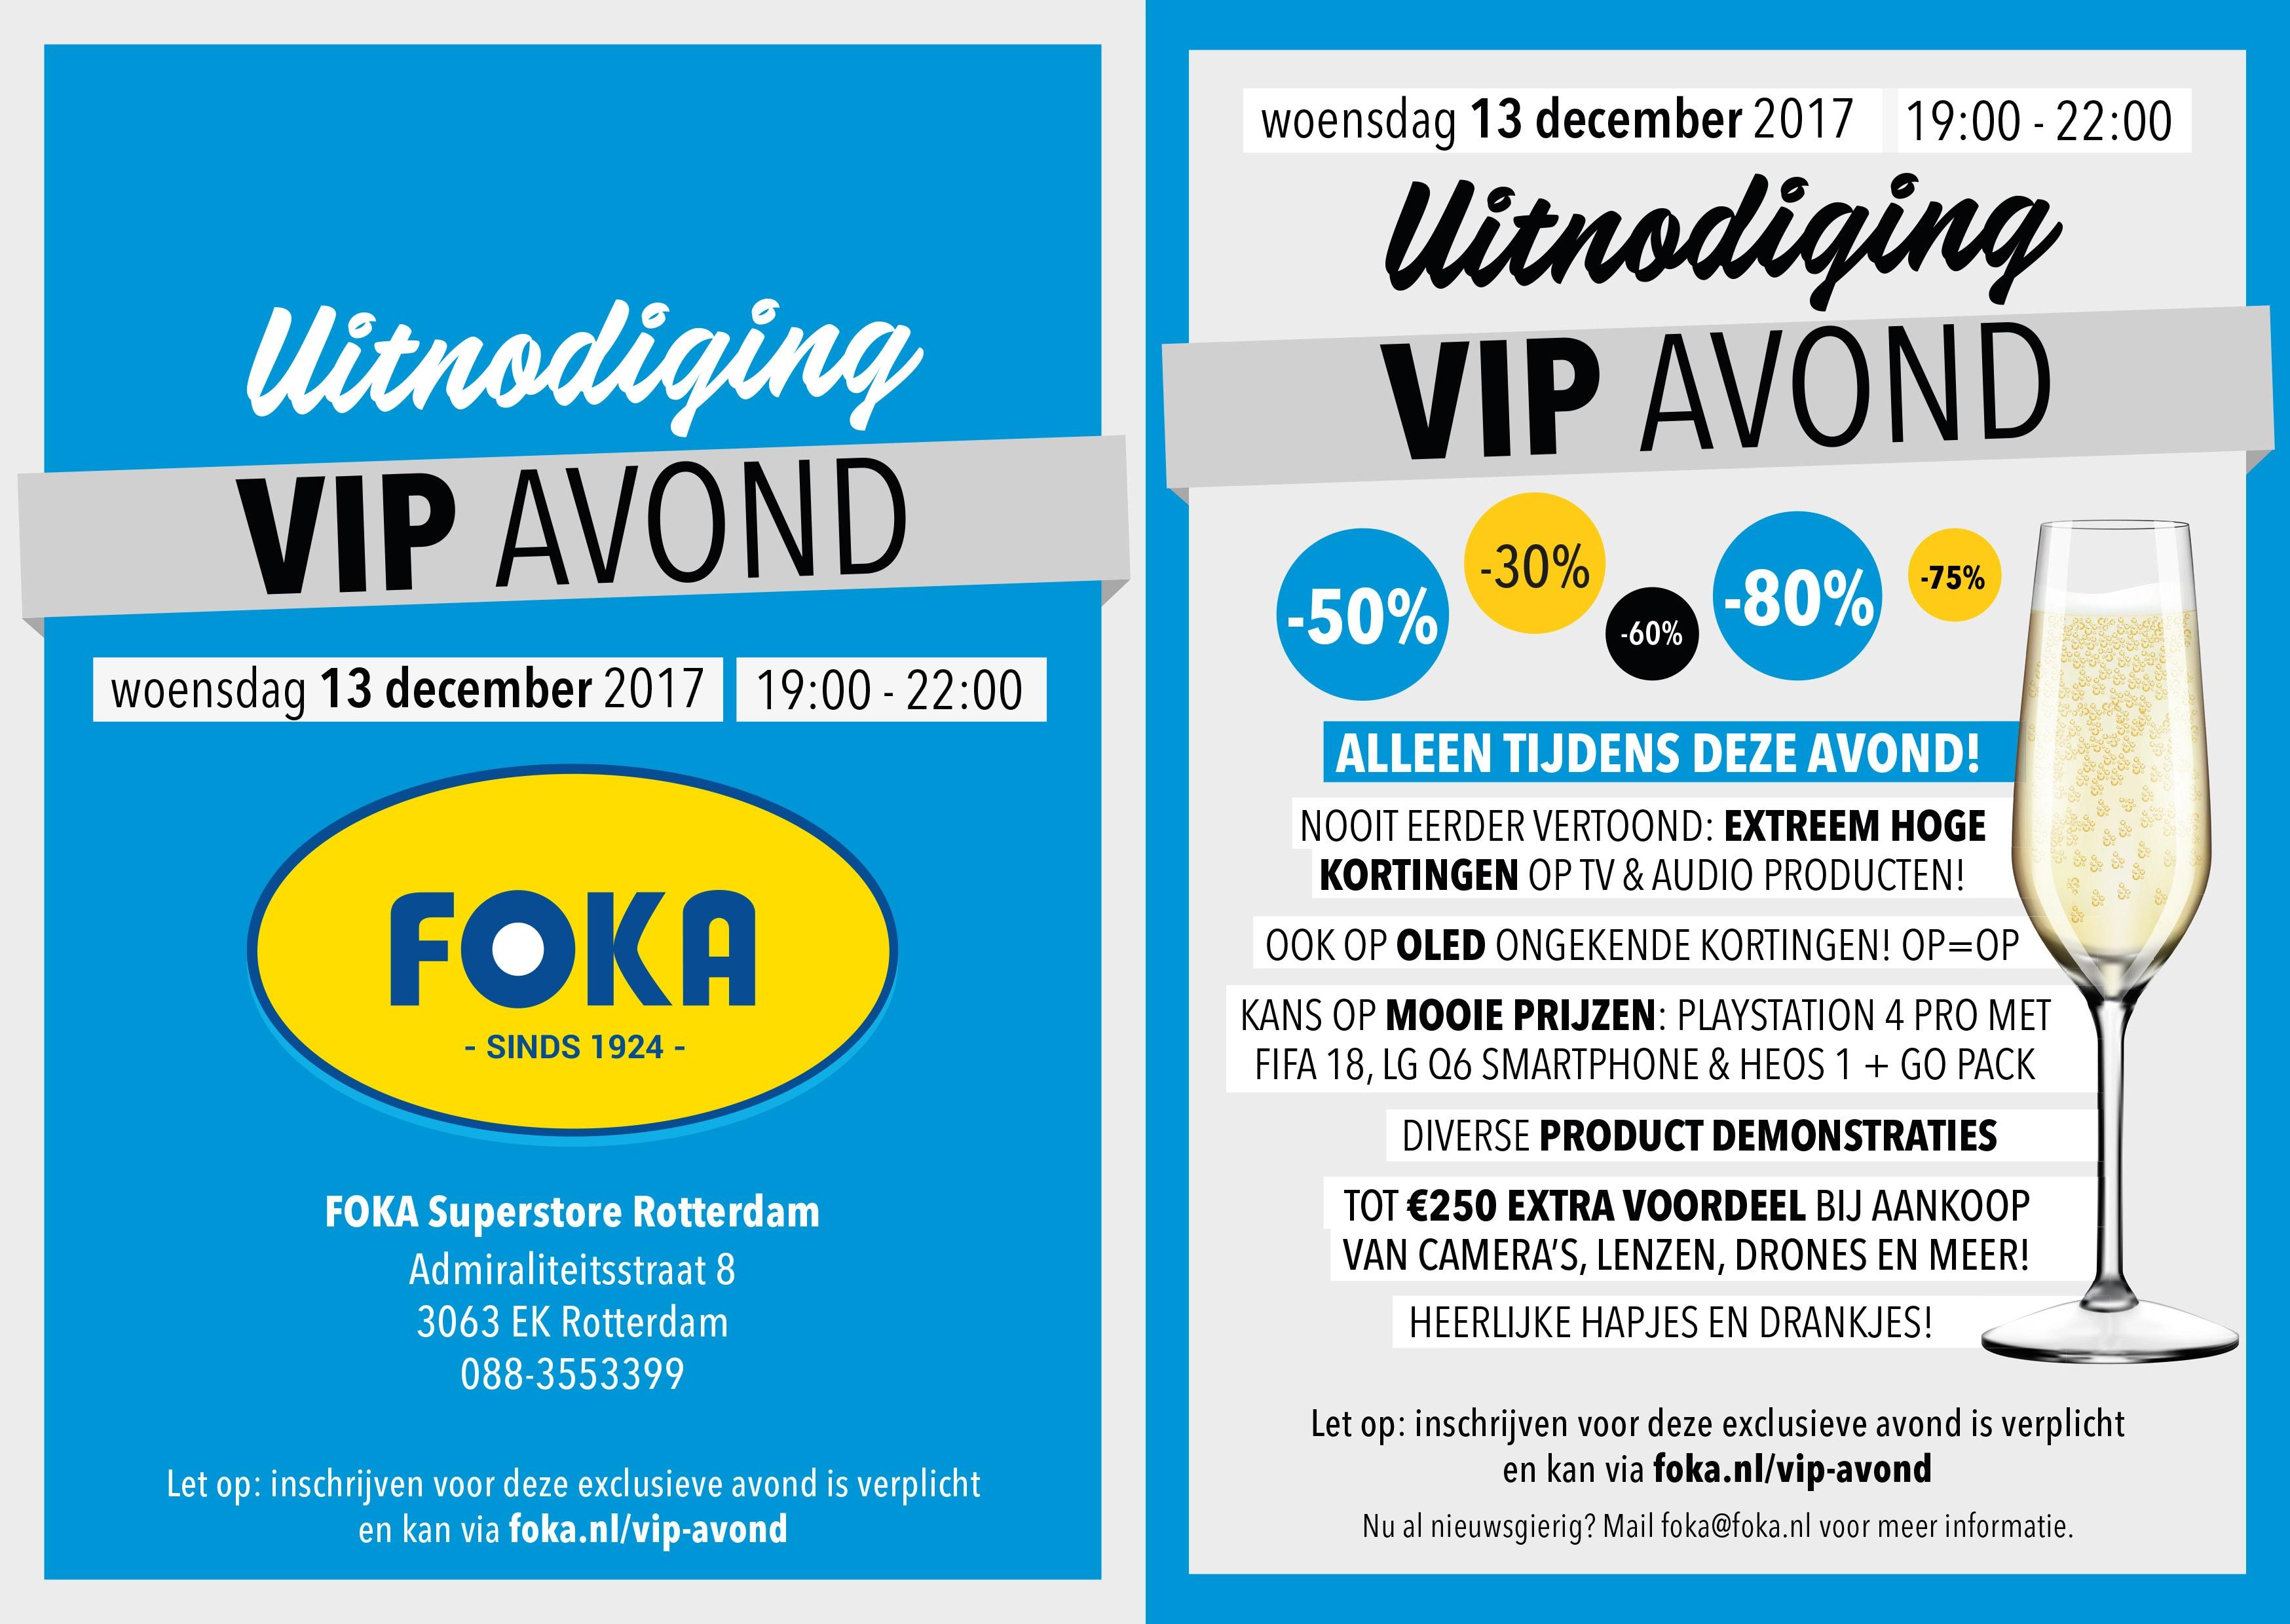 Vip-avond met diverse kortingen @ Foka Superstore Rotterdam